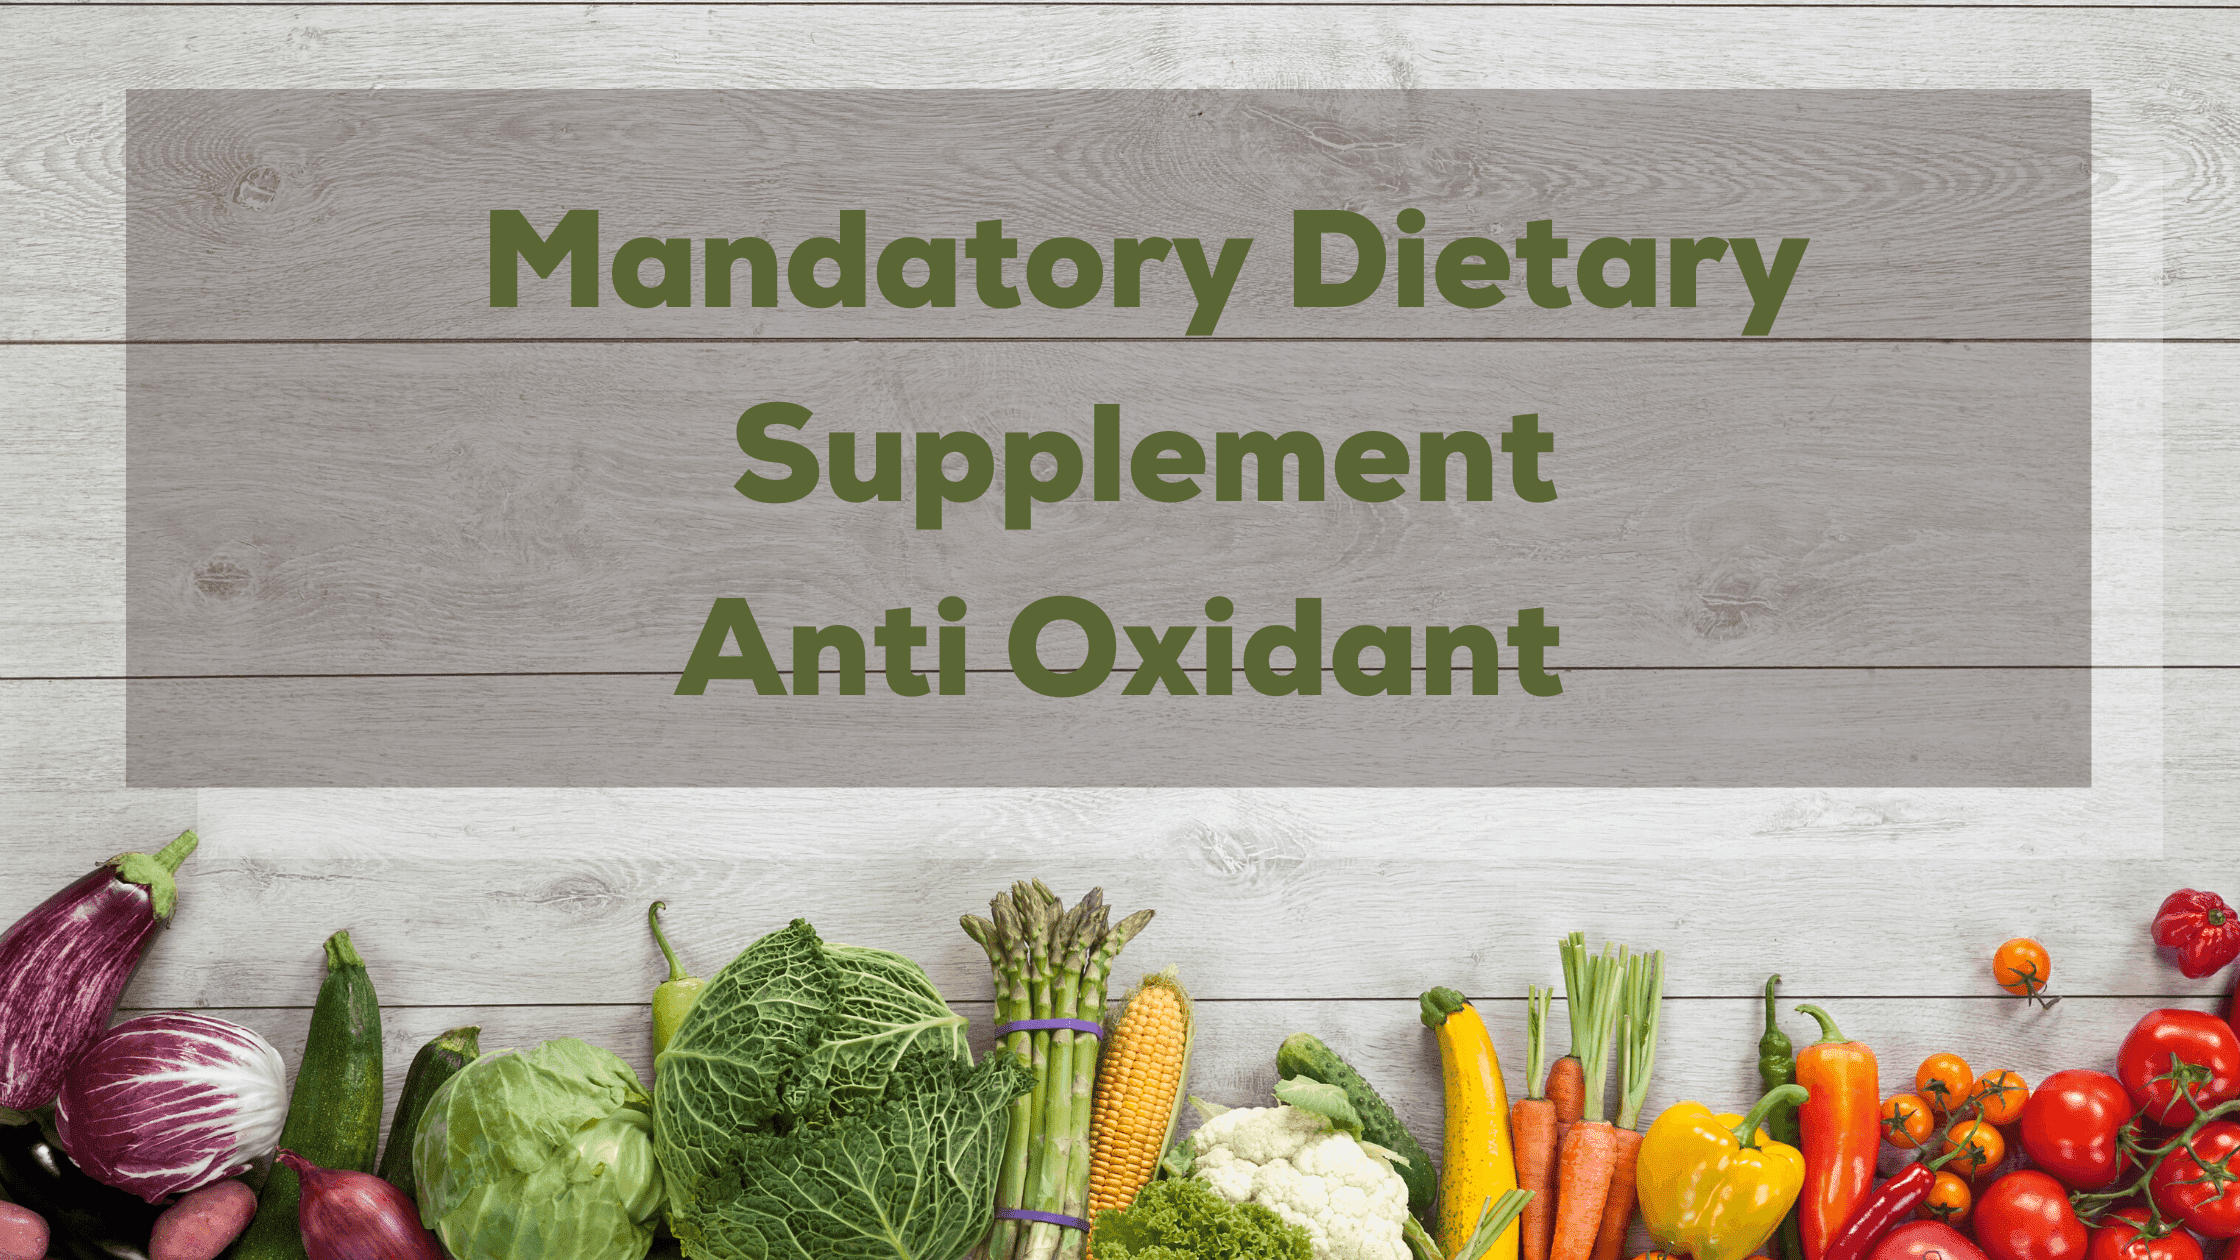 Anti-Oxidant-Is-Mandatory-Dietary-Supplement